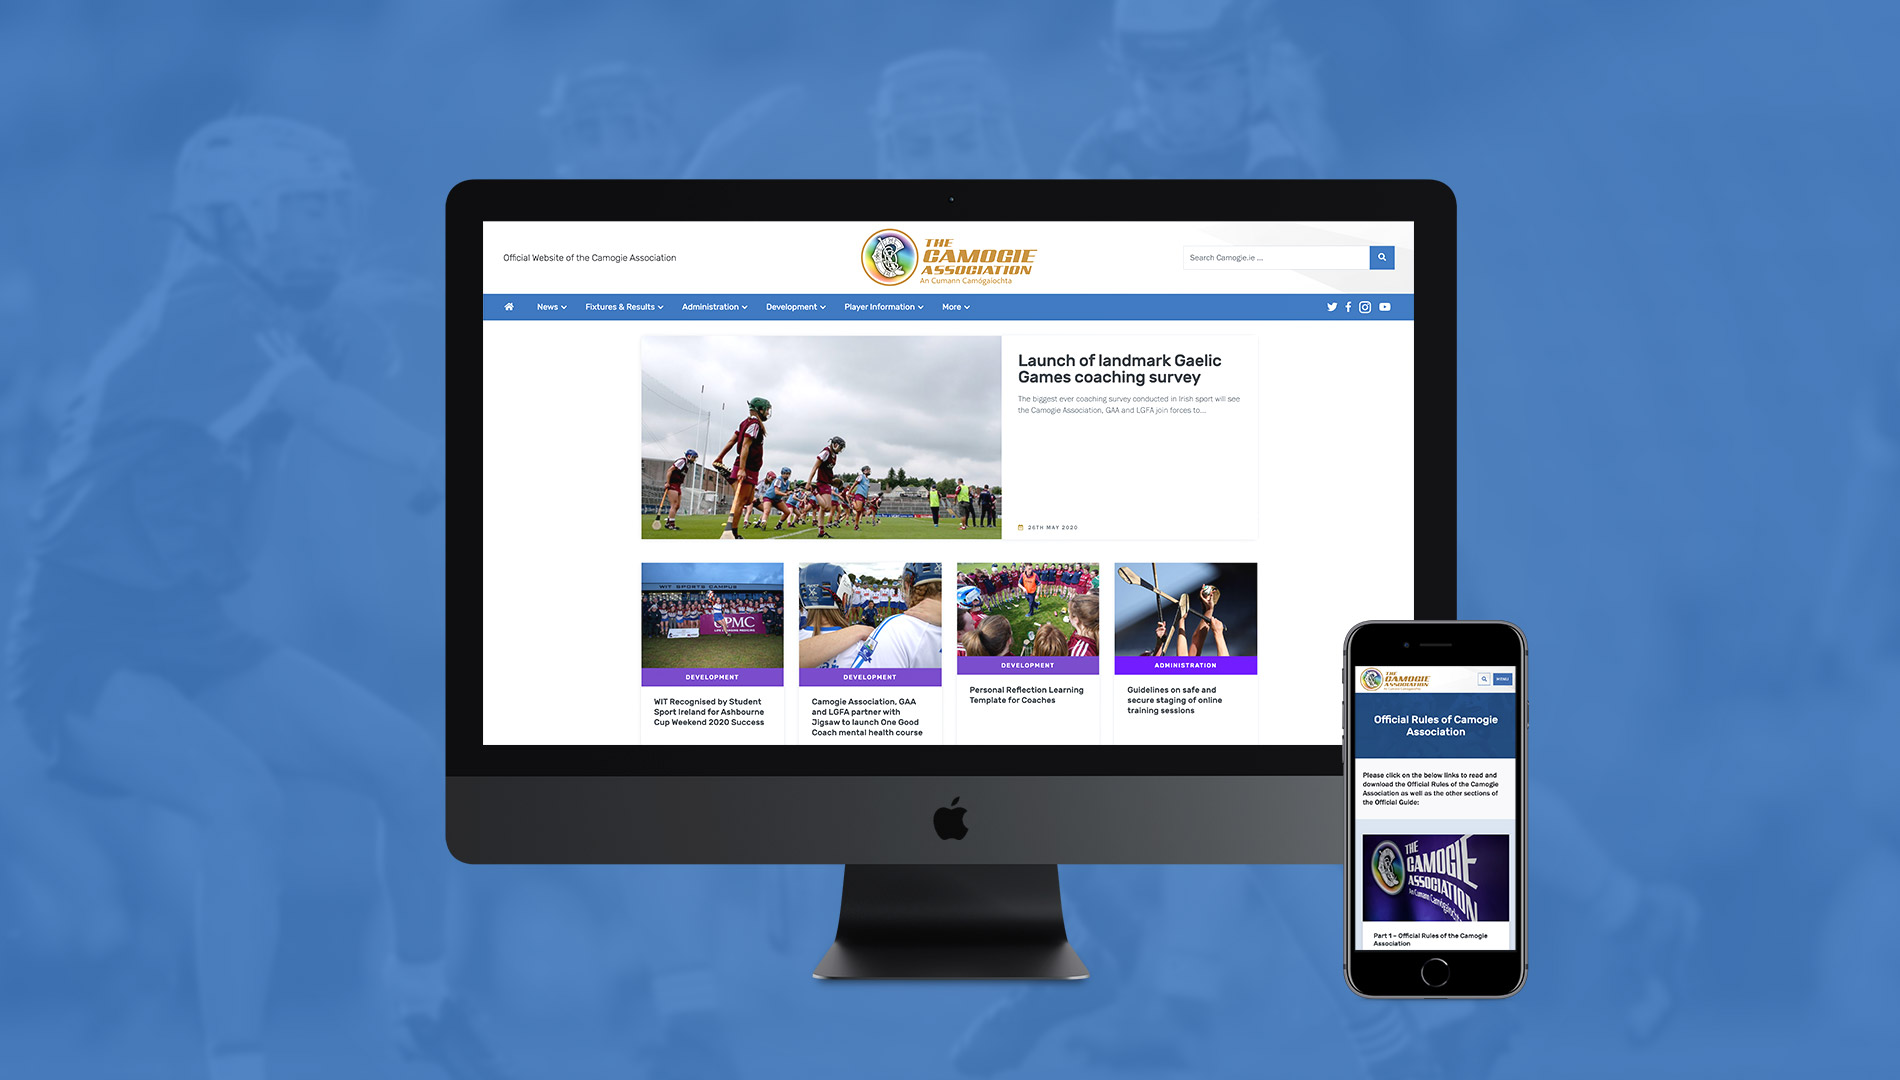 Camogie Association Web Design and WordPress